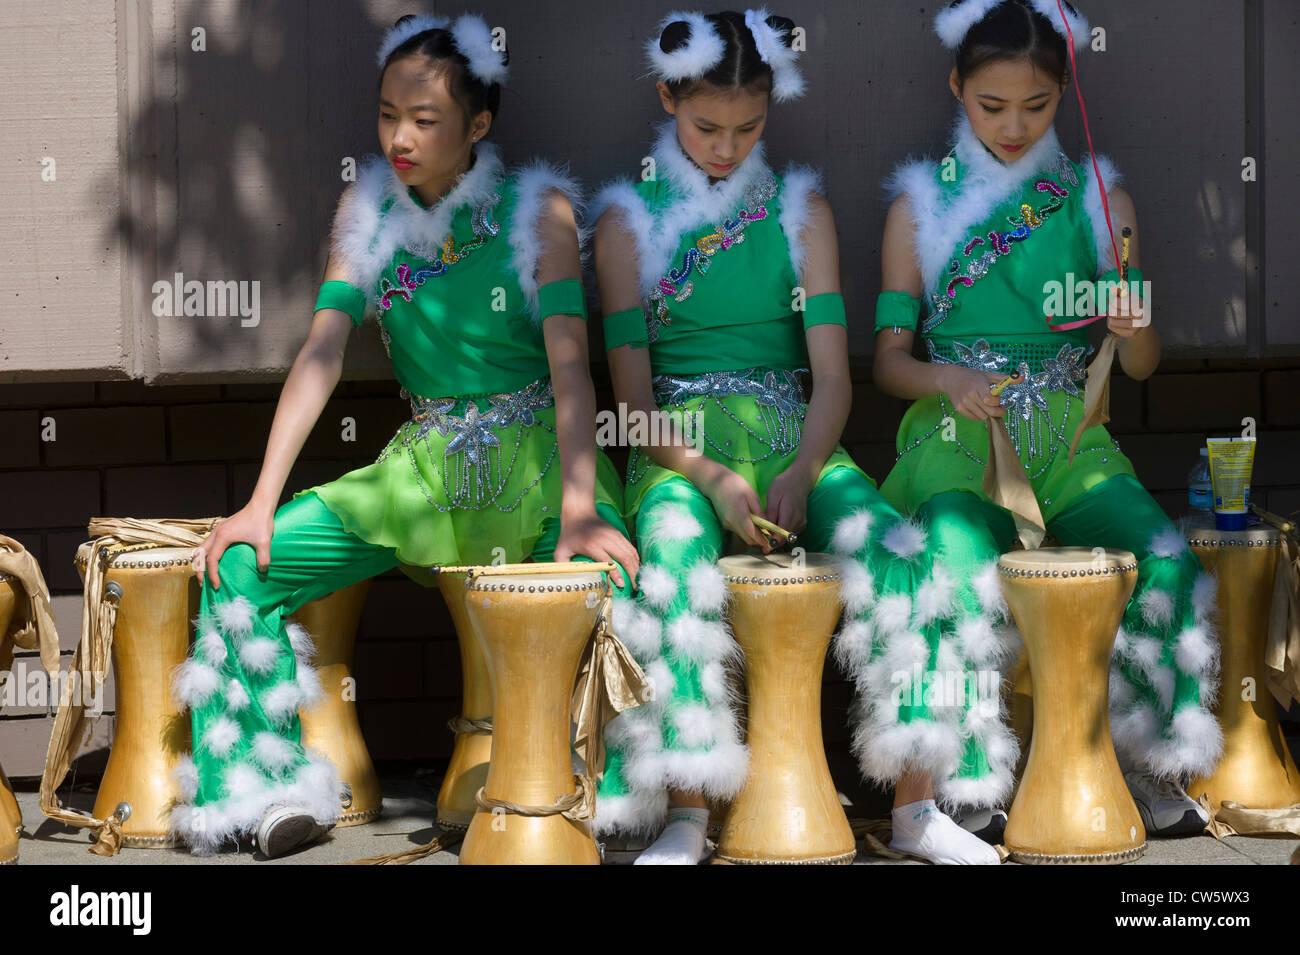 Girls at Italian Heritage Parade, part of Fleet Week, San Francisco, California. - Stock Image